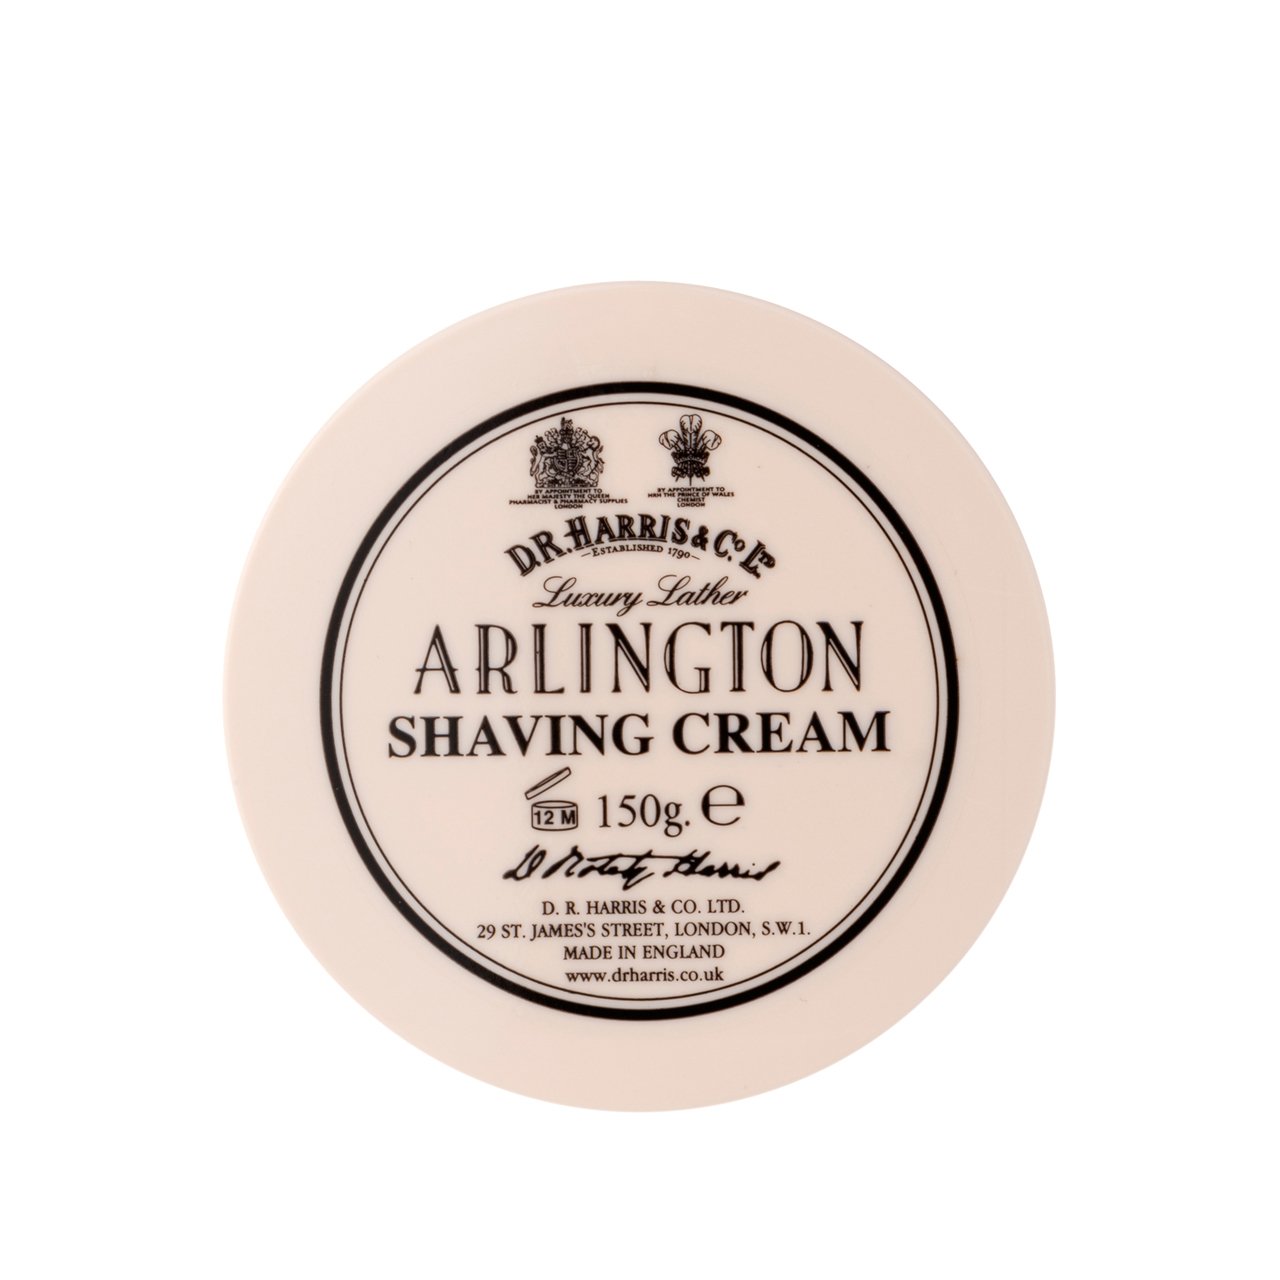 Arlington - Shaving Cream Bowl